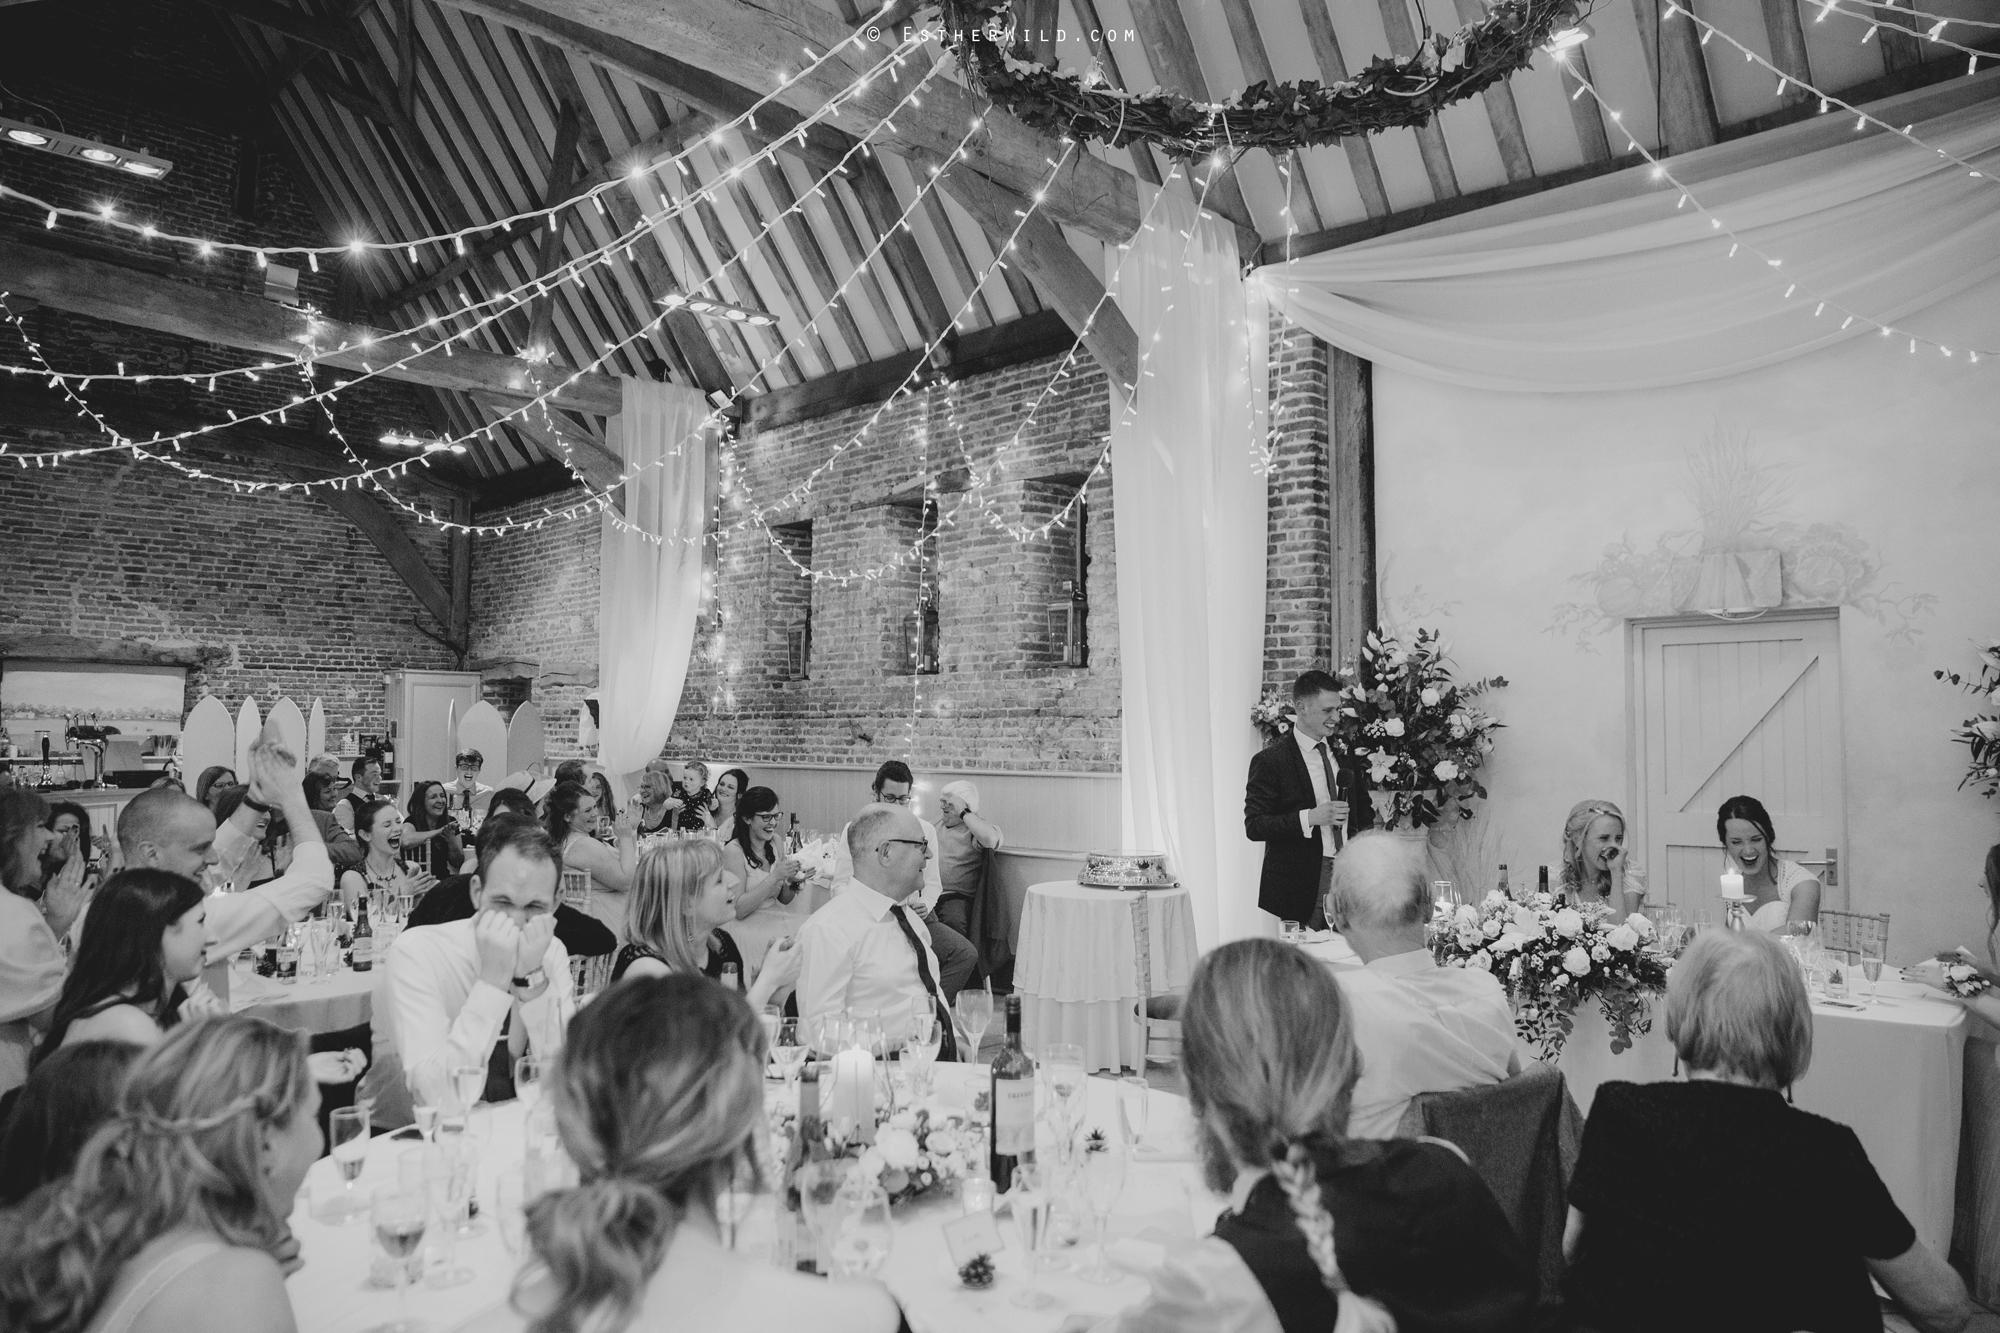 Elms_Barn_Weddings_Suffolk_Photographer_Copyright_Esther_Wild_IMG_2868-1.jpg